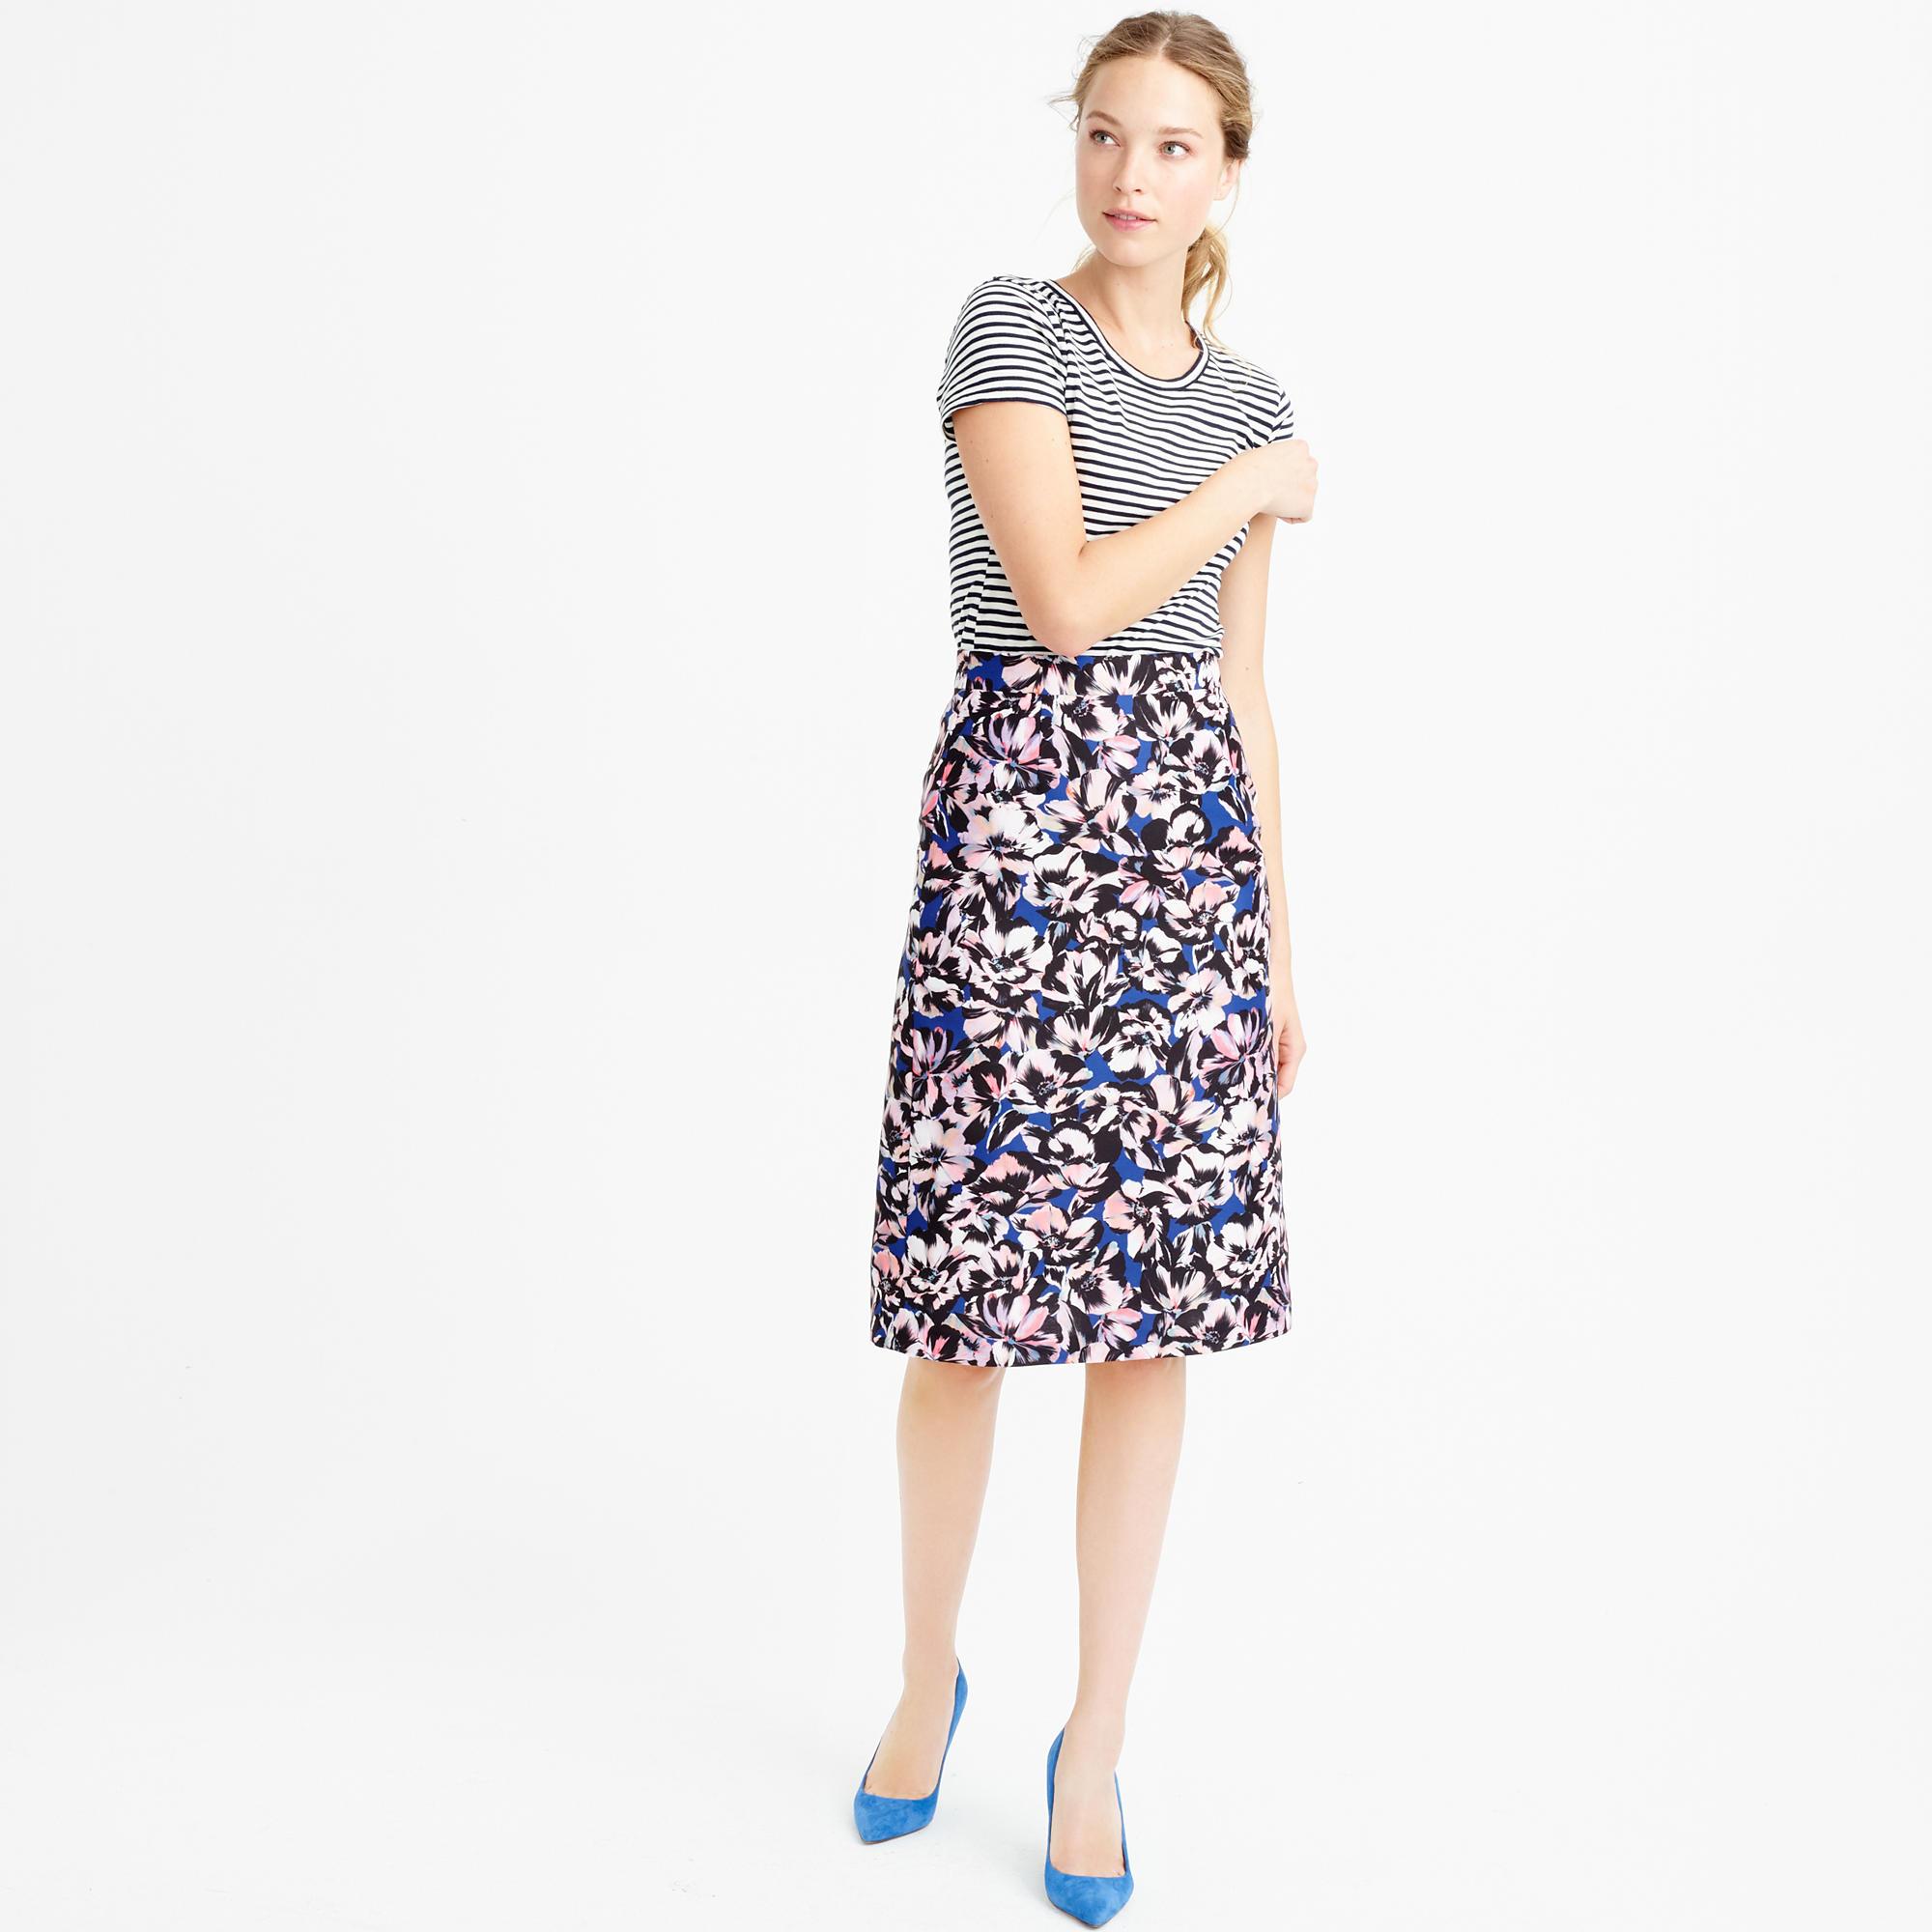 A-line skirt in hibiscus print : Women A-line/Midi | J.Crew